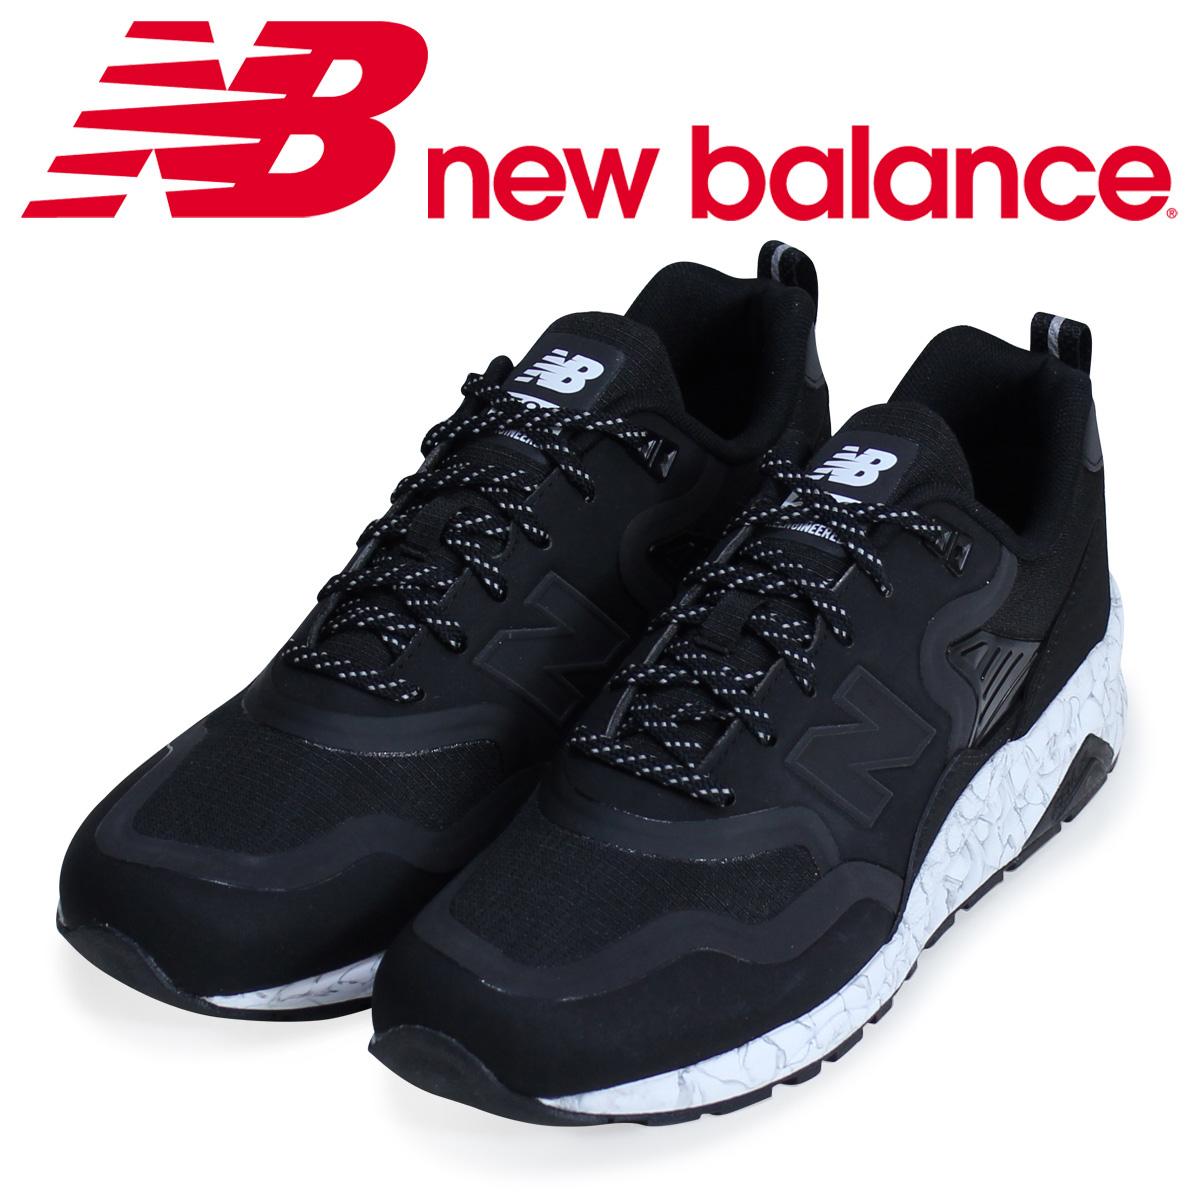 new balance 580 mens